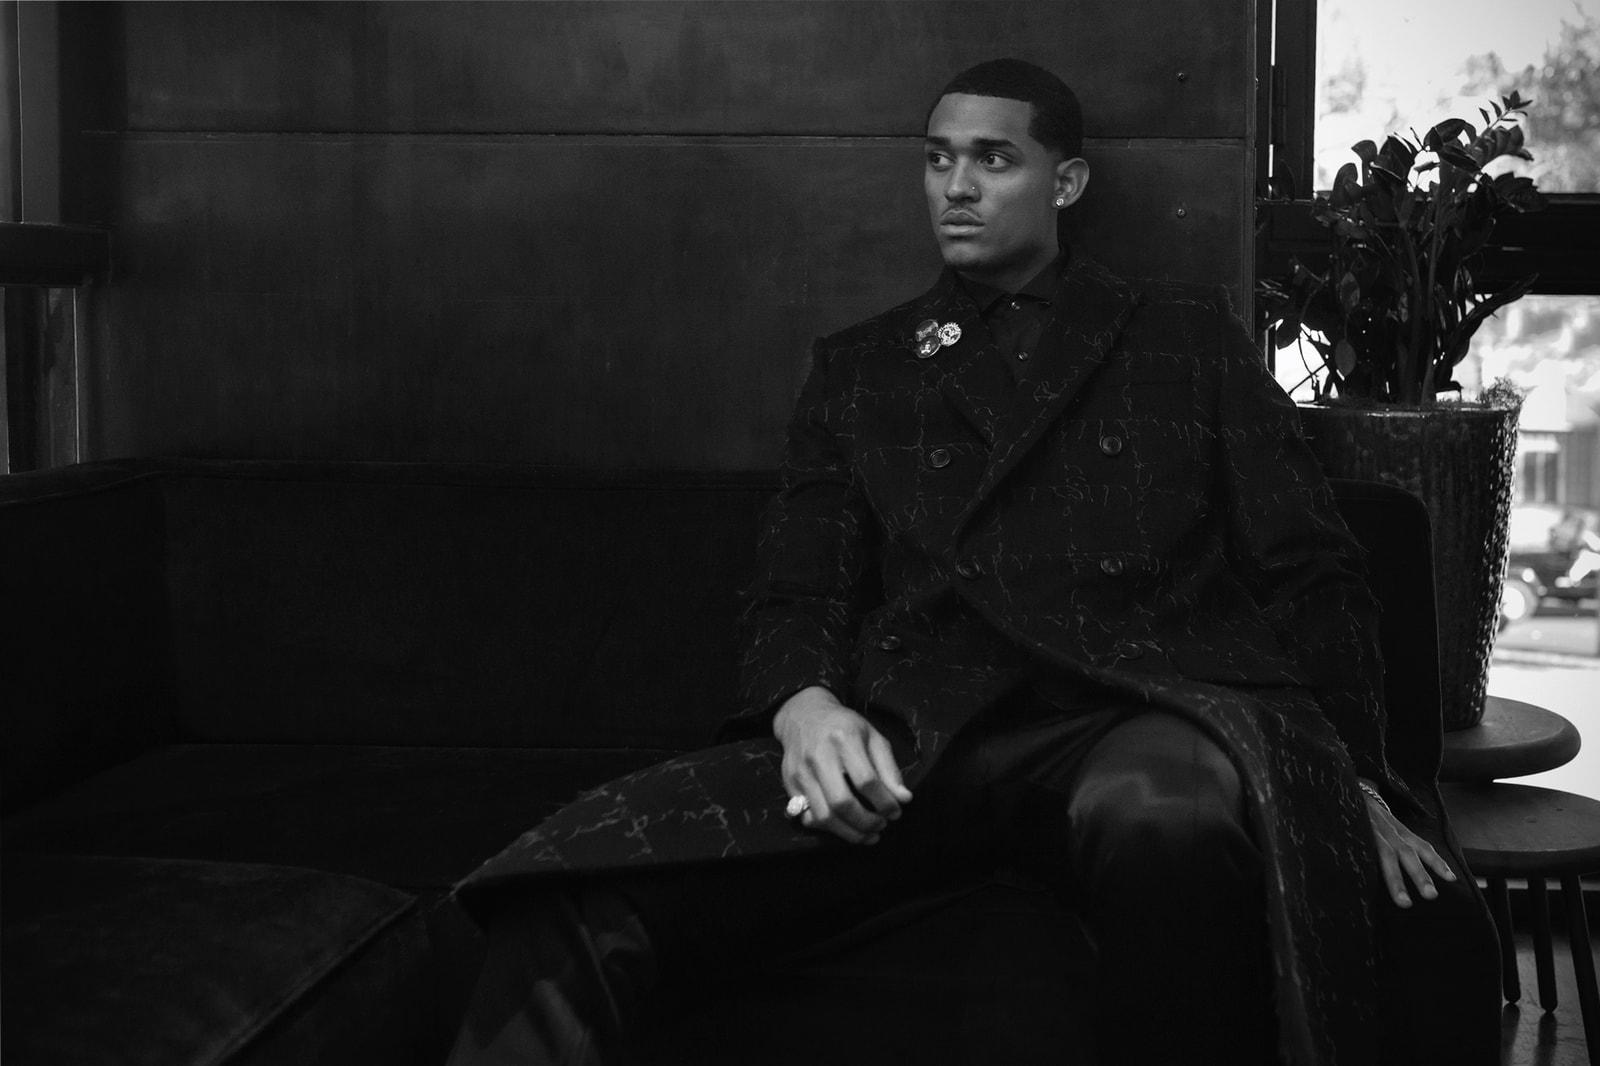 jordan-clarkson-interview-fashion-kendall-jenner-kobe-bryant-lakers-0